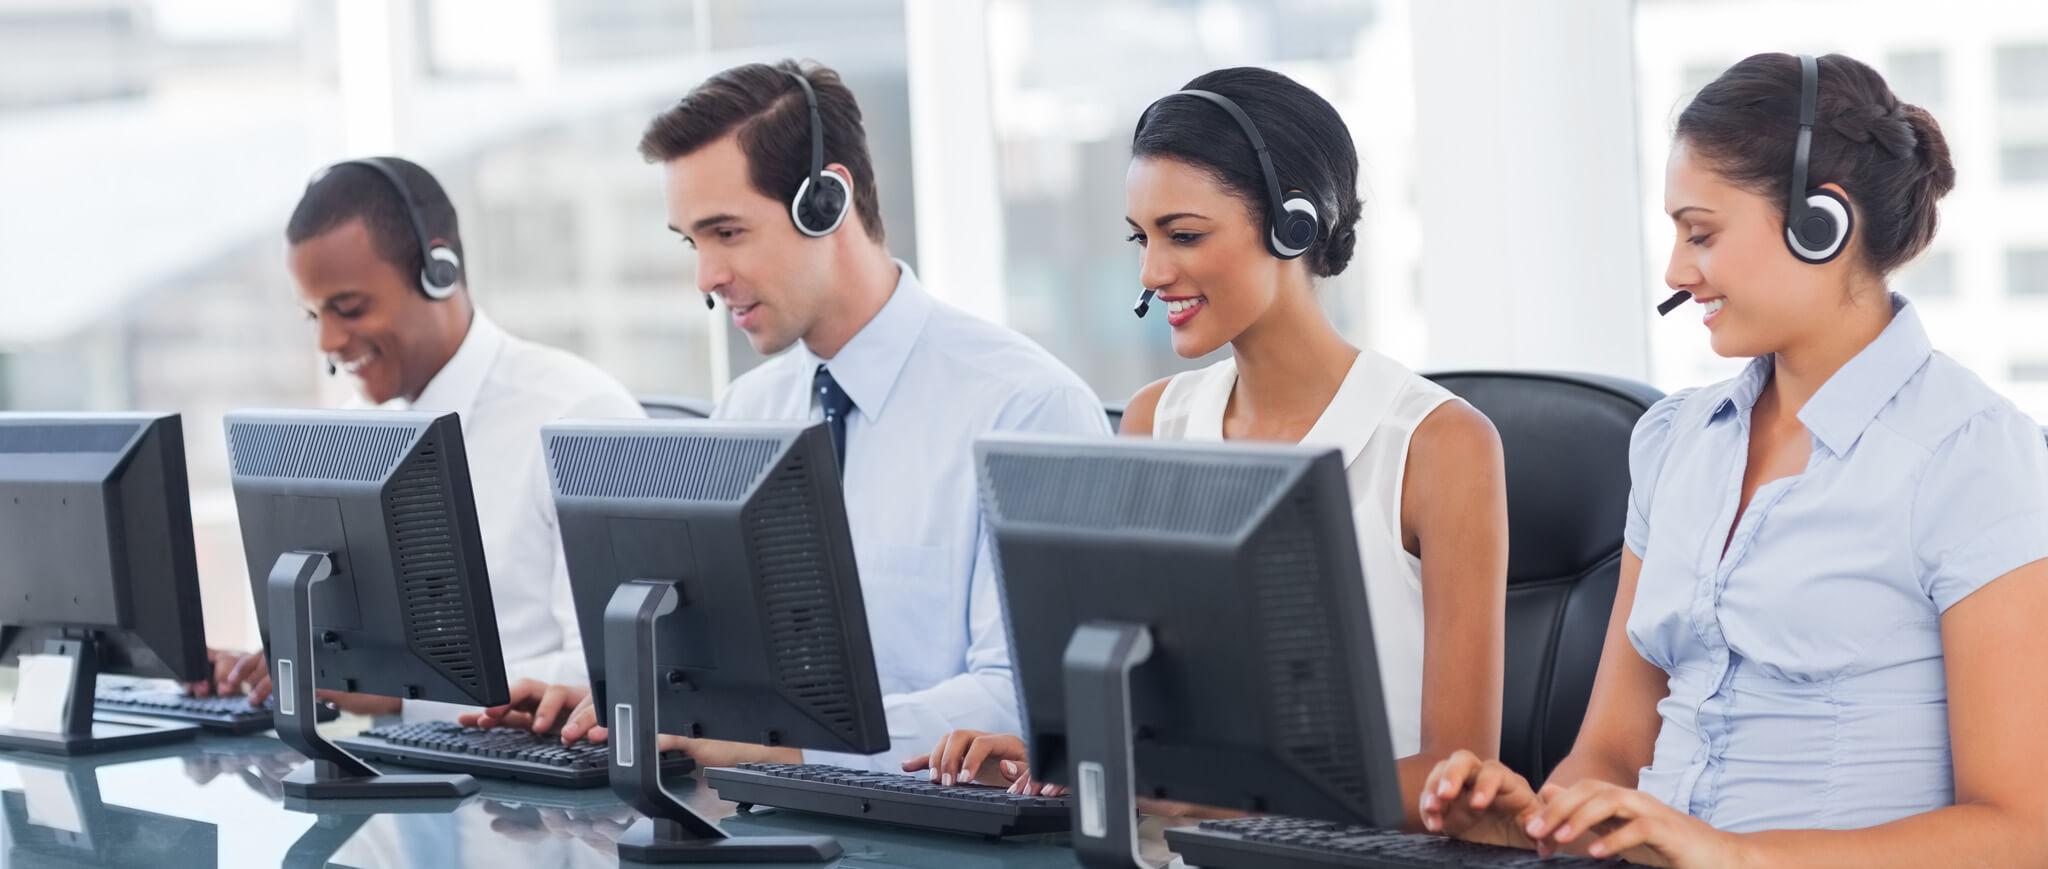 computer-telephony integration